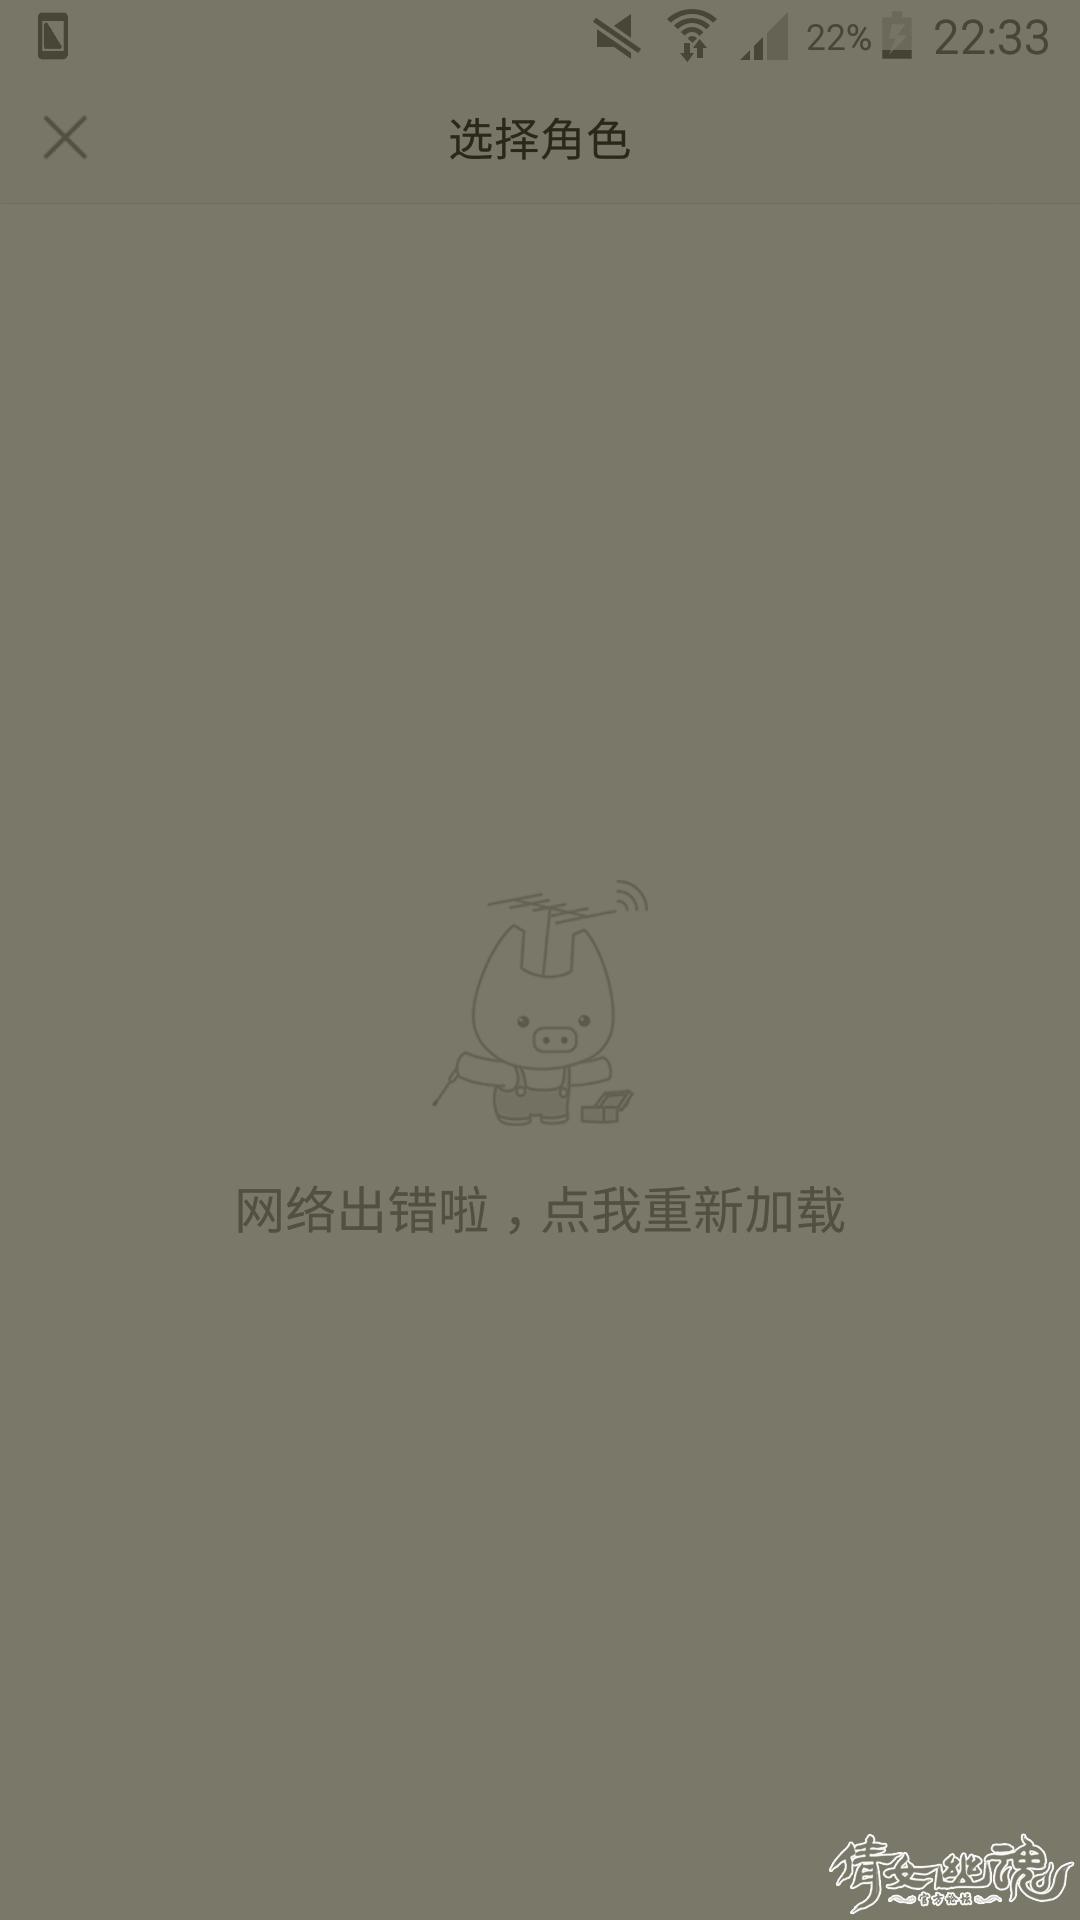 Screenshot_2018-02-28-22-33-06.png